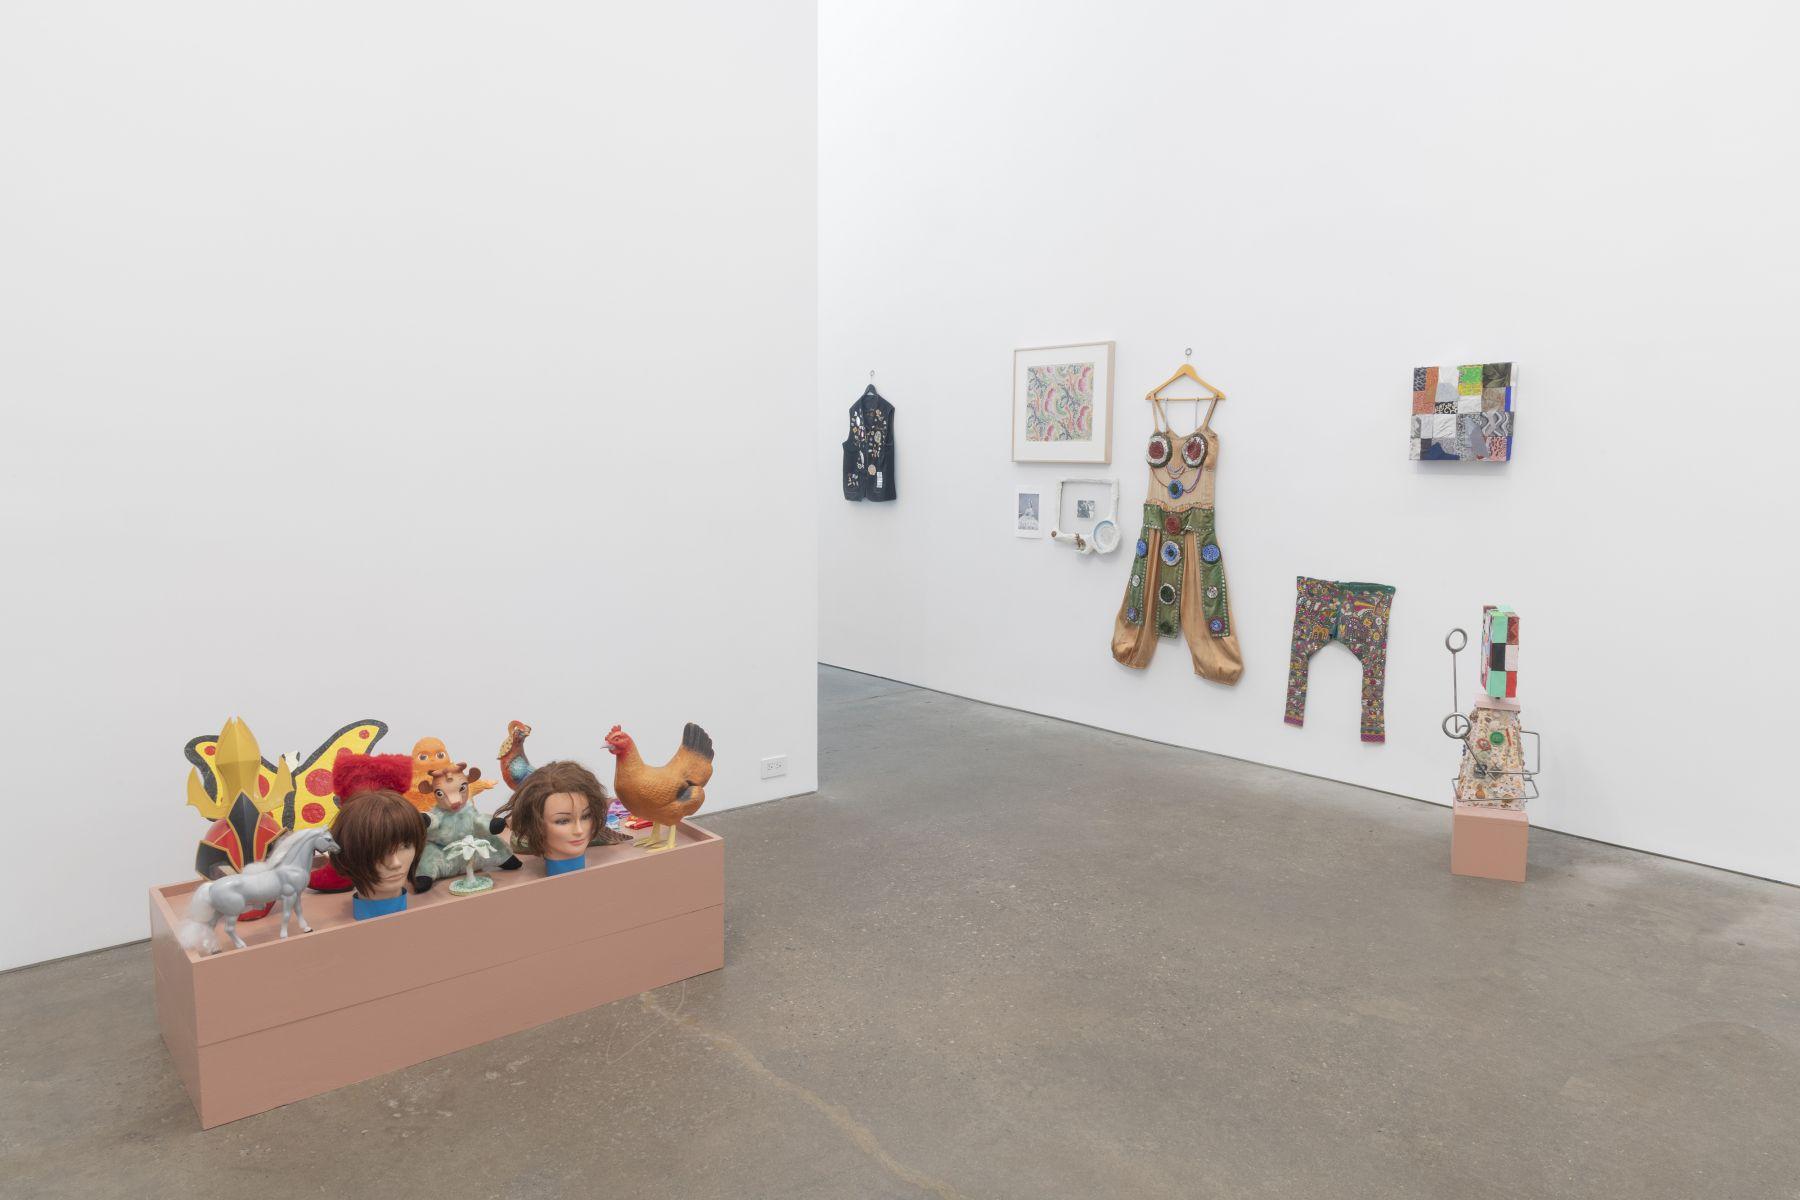 Nancy Shaver,A part of a part of a part, installation view at Derek Eller Gallery, New York